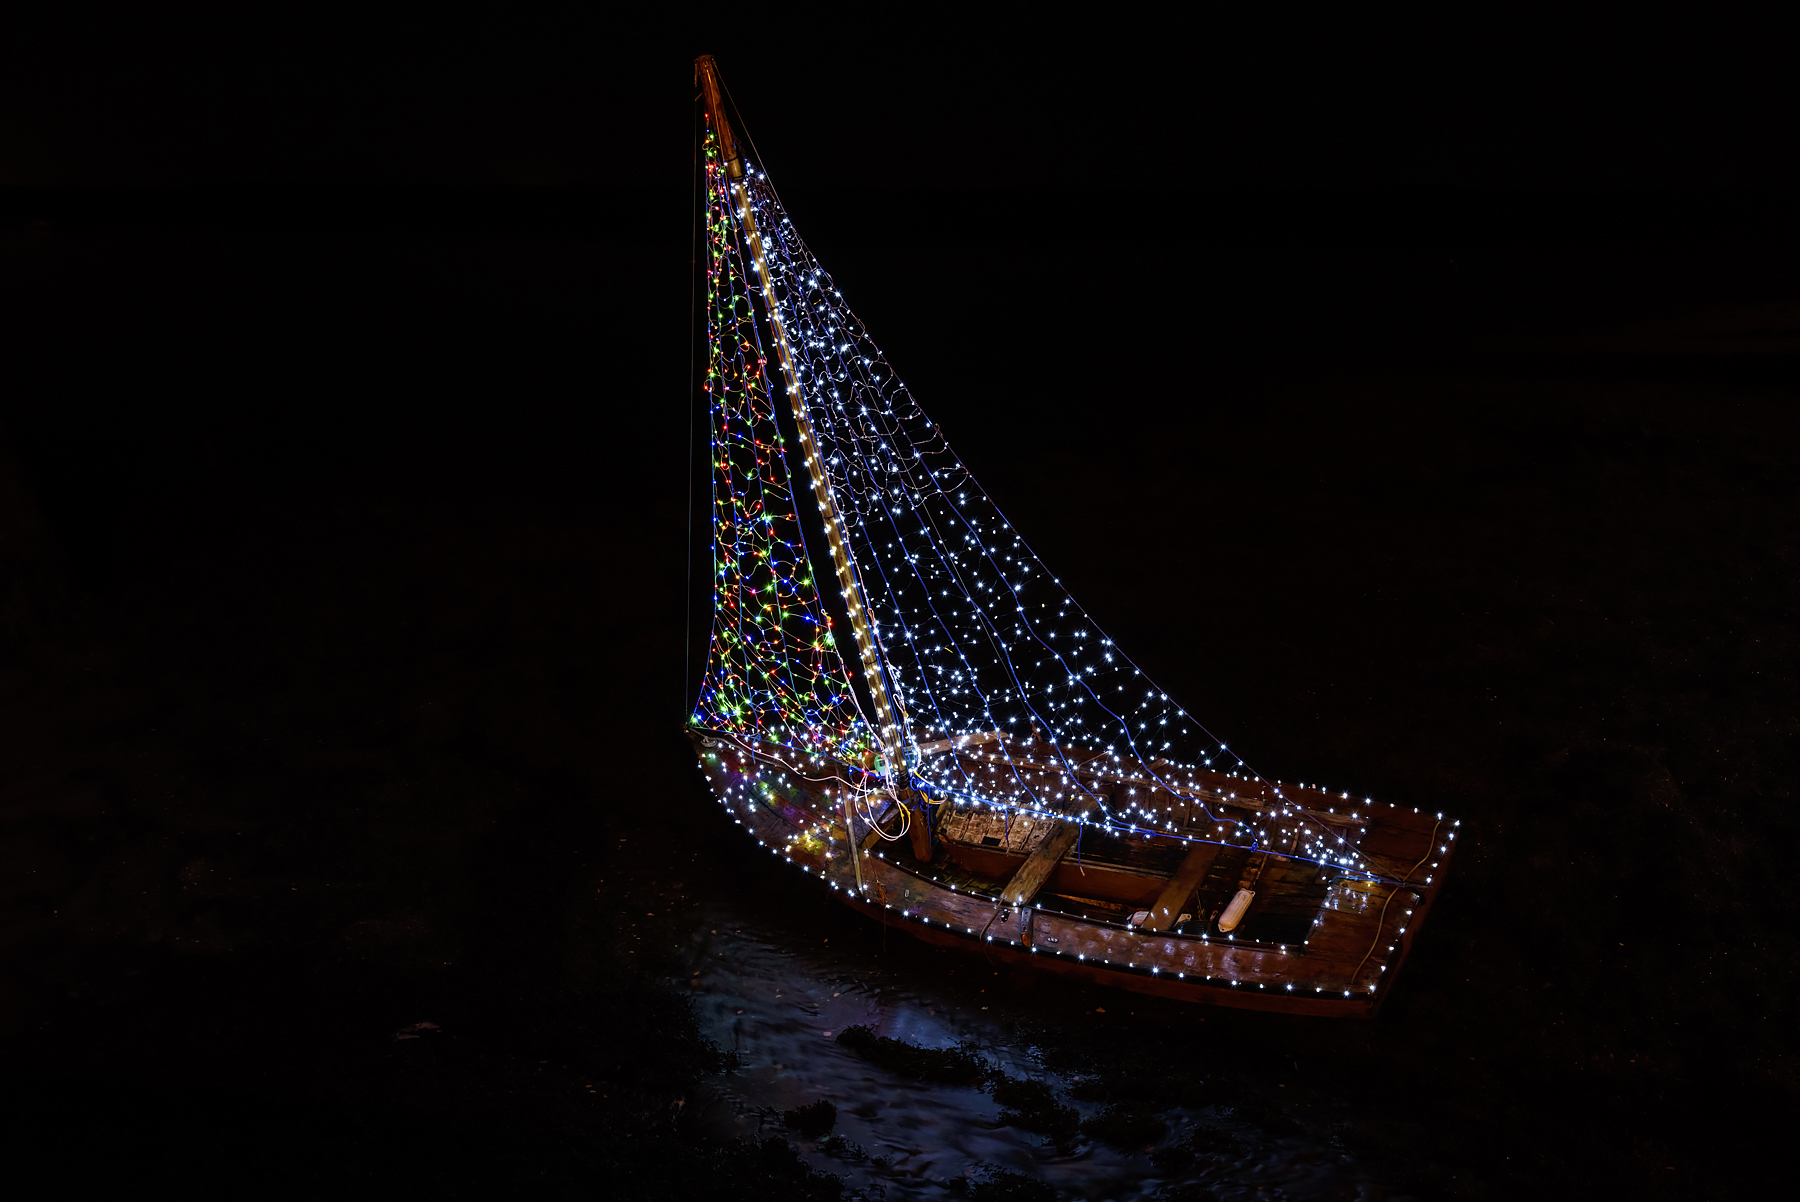 The Christmas Boat, Kinvara, Co. Galway, Ireland. Nikon D750, Nikon 24-120/4, ISO 800, 1s at f/8, Tripod. December. © Carsten Krieger.